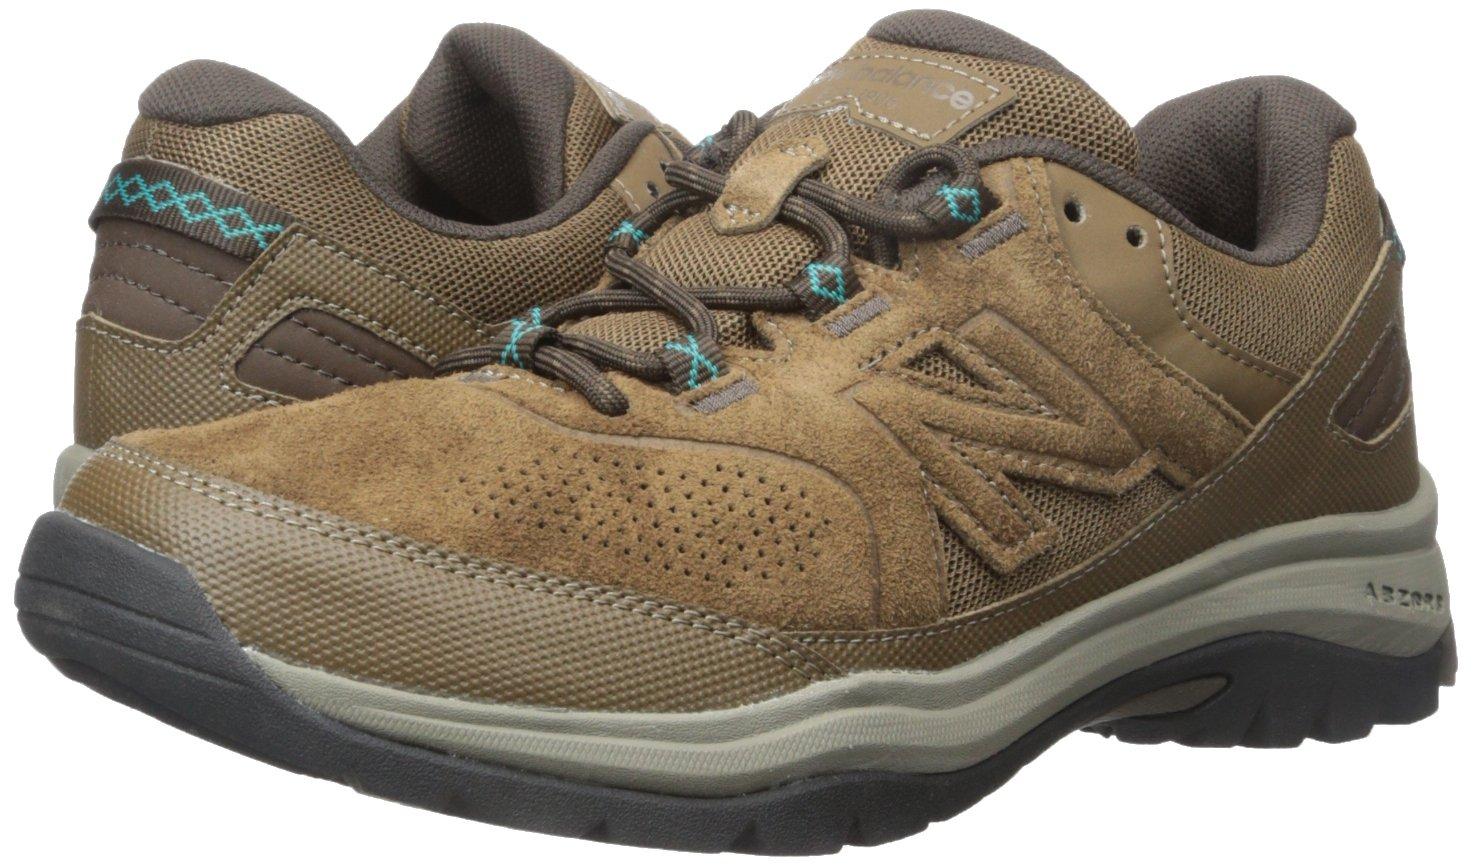 New Balance Women's WW769V1 Walking Shoe B01641CJBG 8 B(M) US|Brown